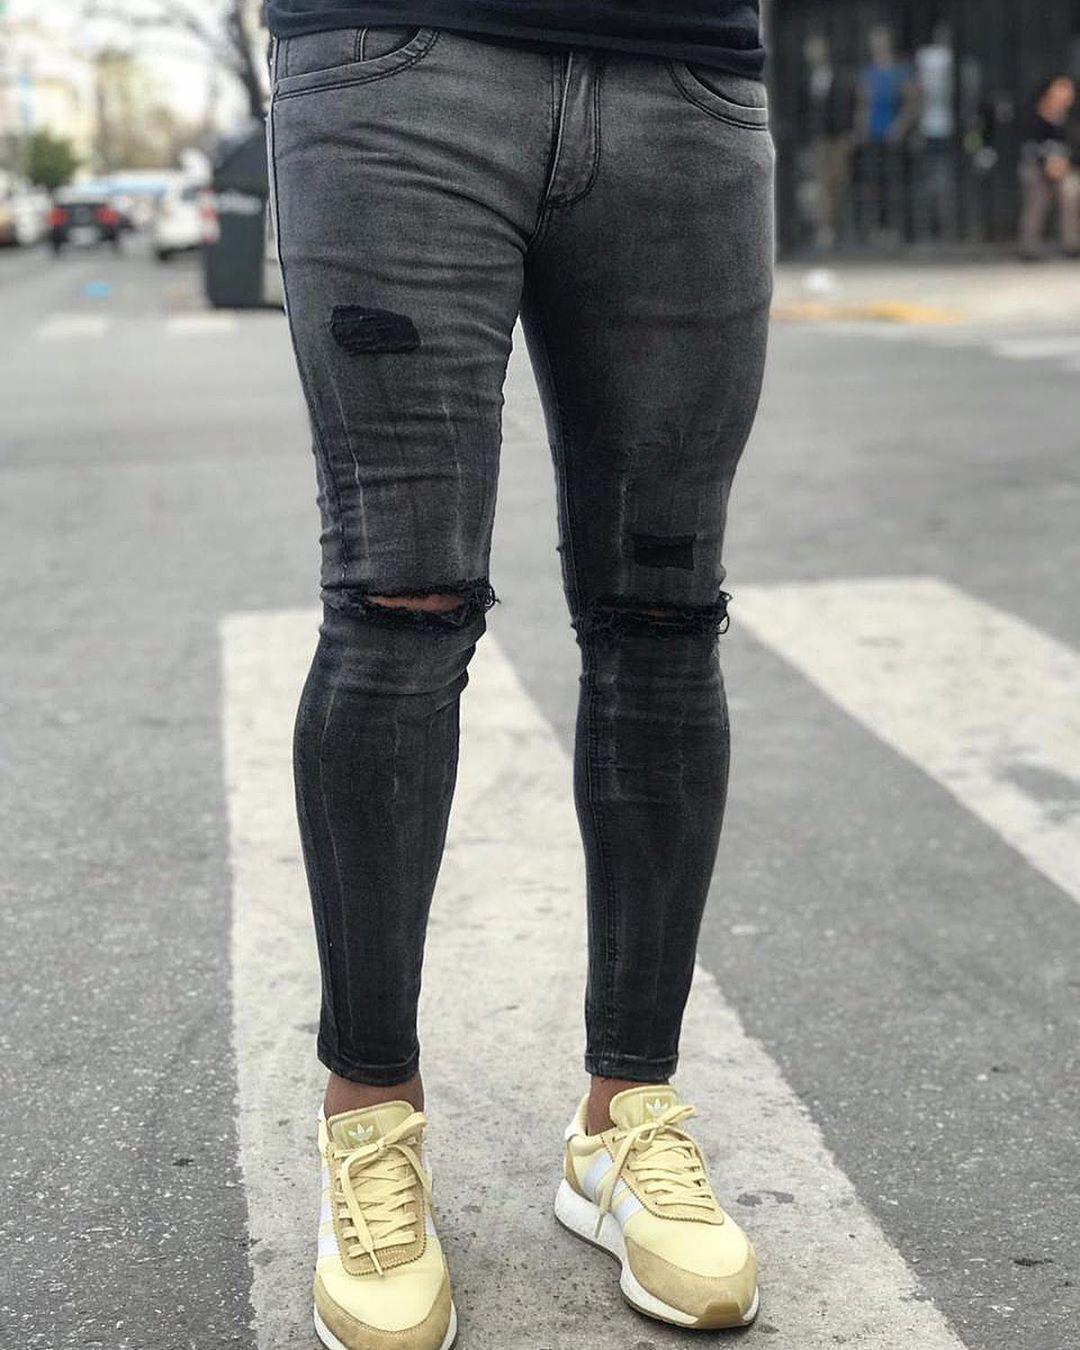 Pin De Pantalon Tk En Pantalones De Chino Ropa De Hombre Ropa Moda Club